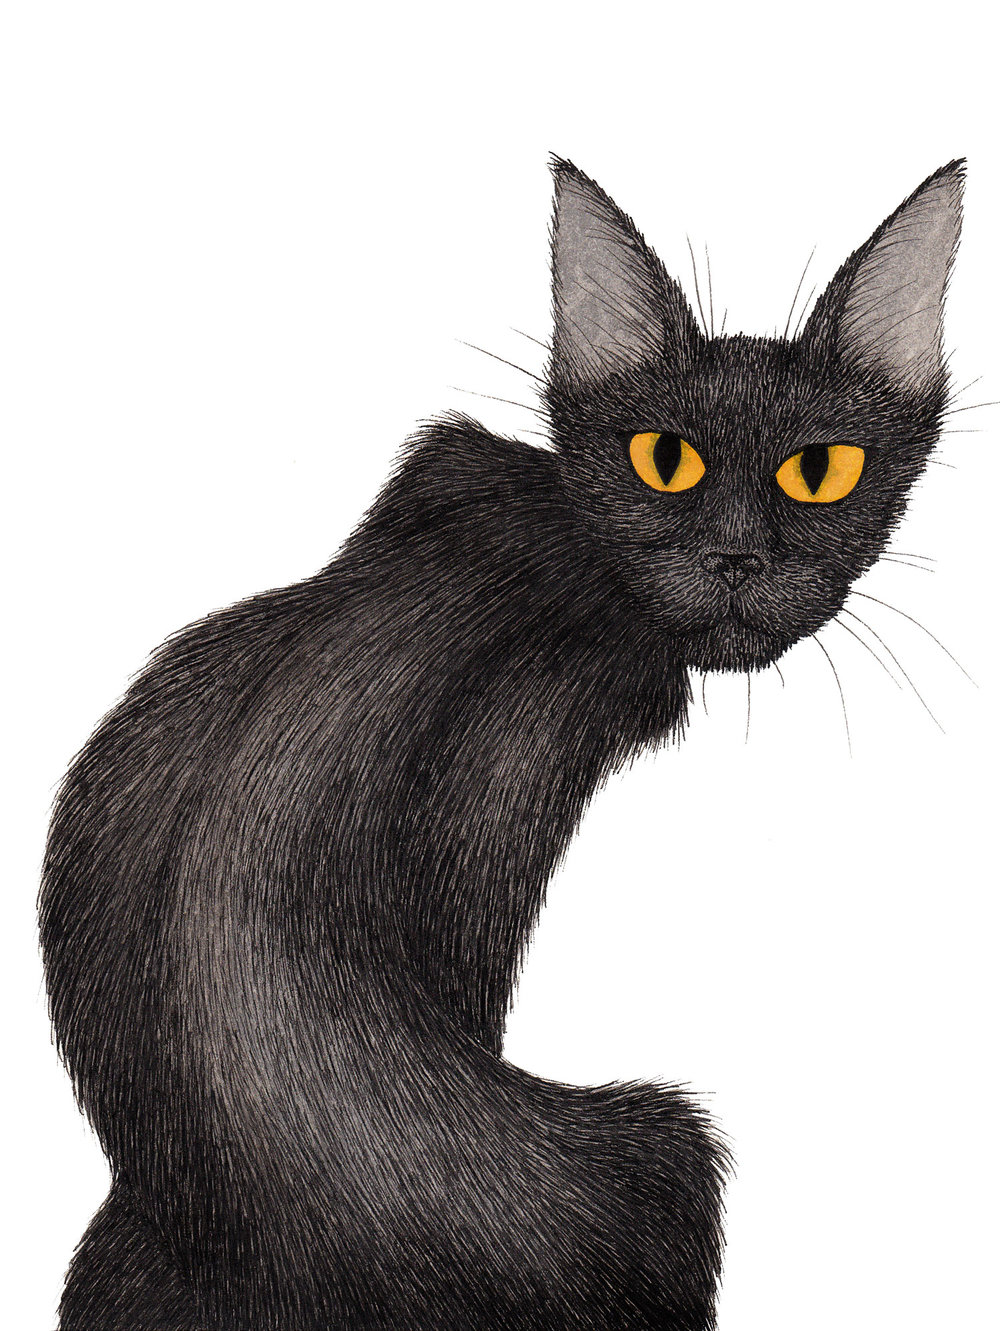 black-cat-yellow-eyes-illustration-matthew-woods.jpg